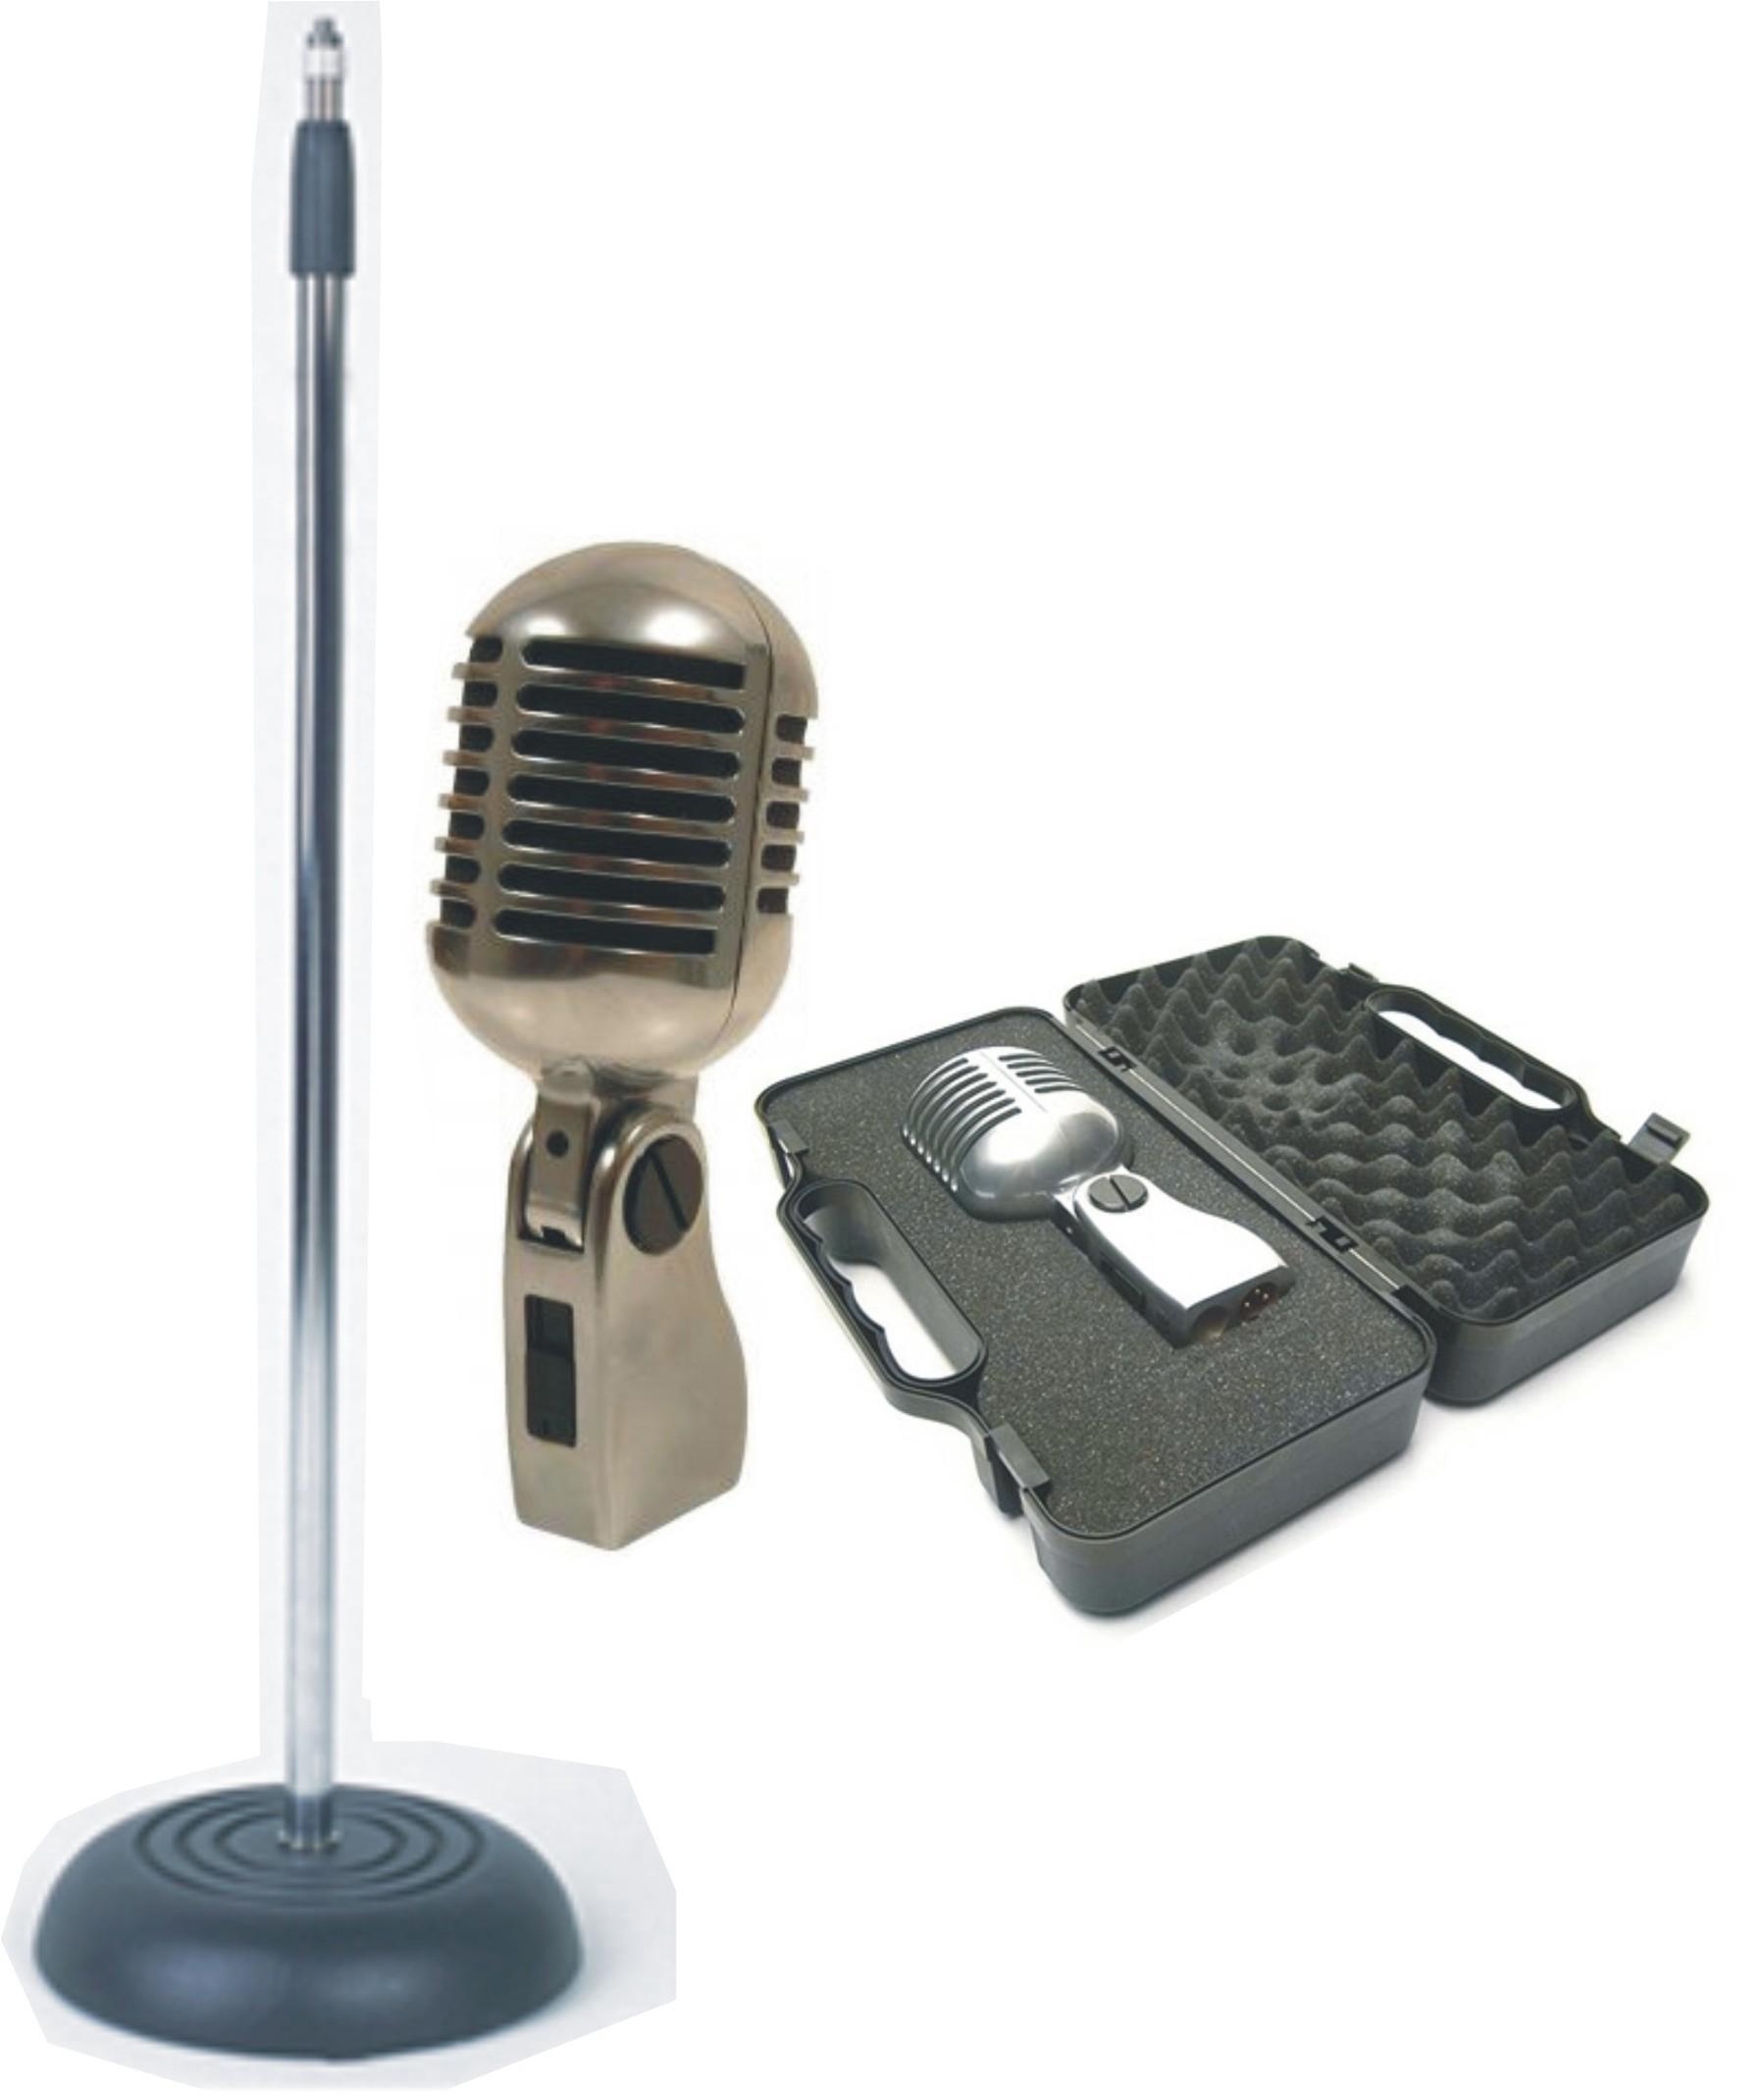 YOGA Vintage Style Elvis Retro Microphone & Matching Stand ... Retro Microphone With Stand